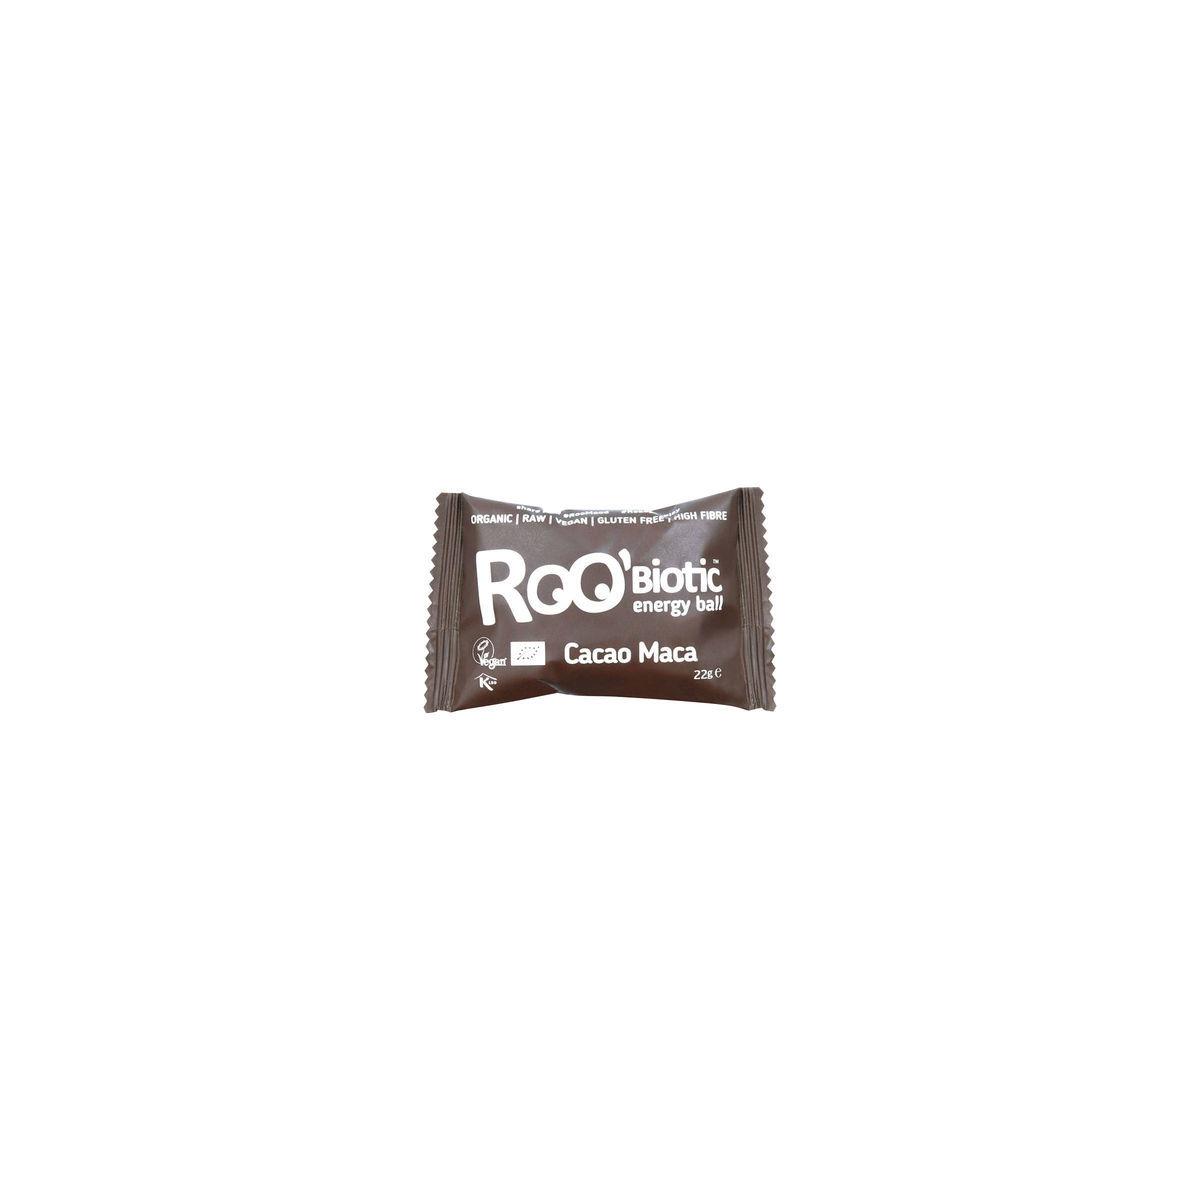 RooBiotic Cacao Maca Energy Ball Stück 22 g - Roobar